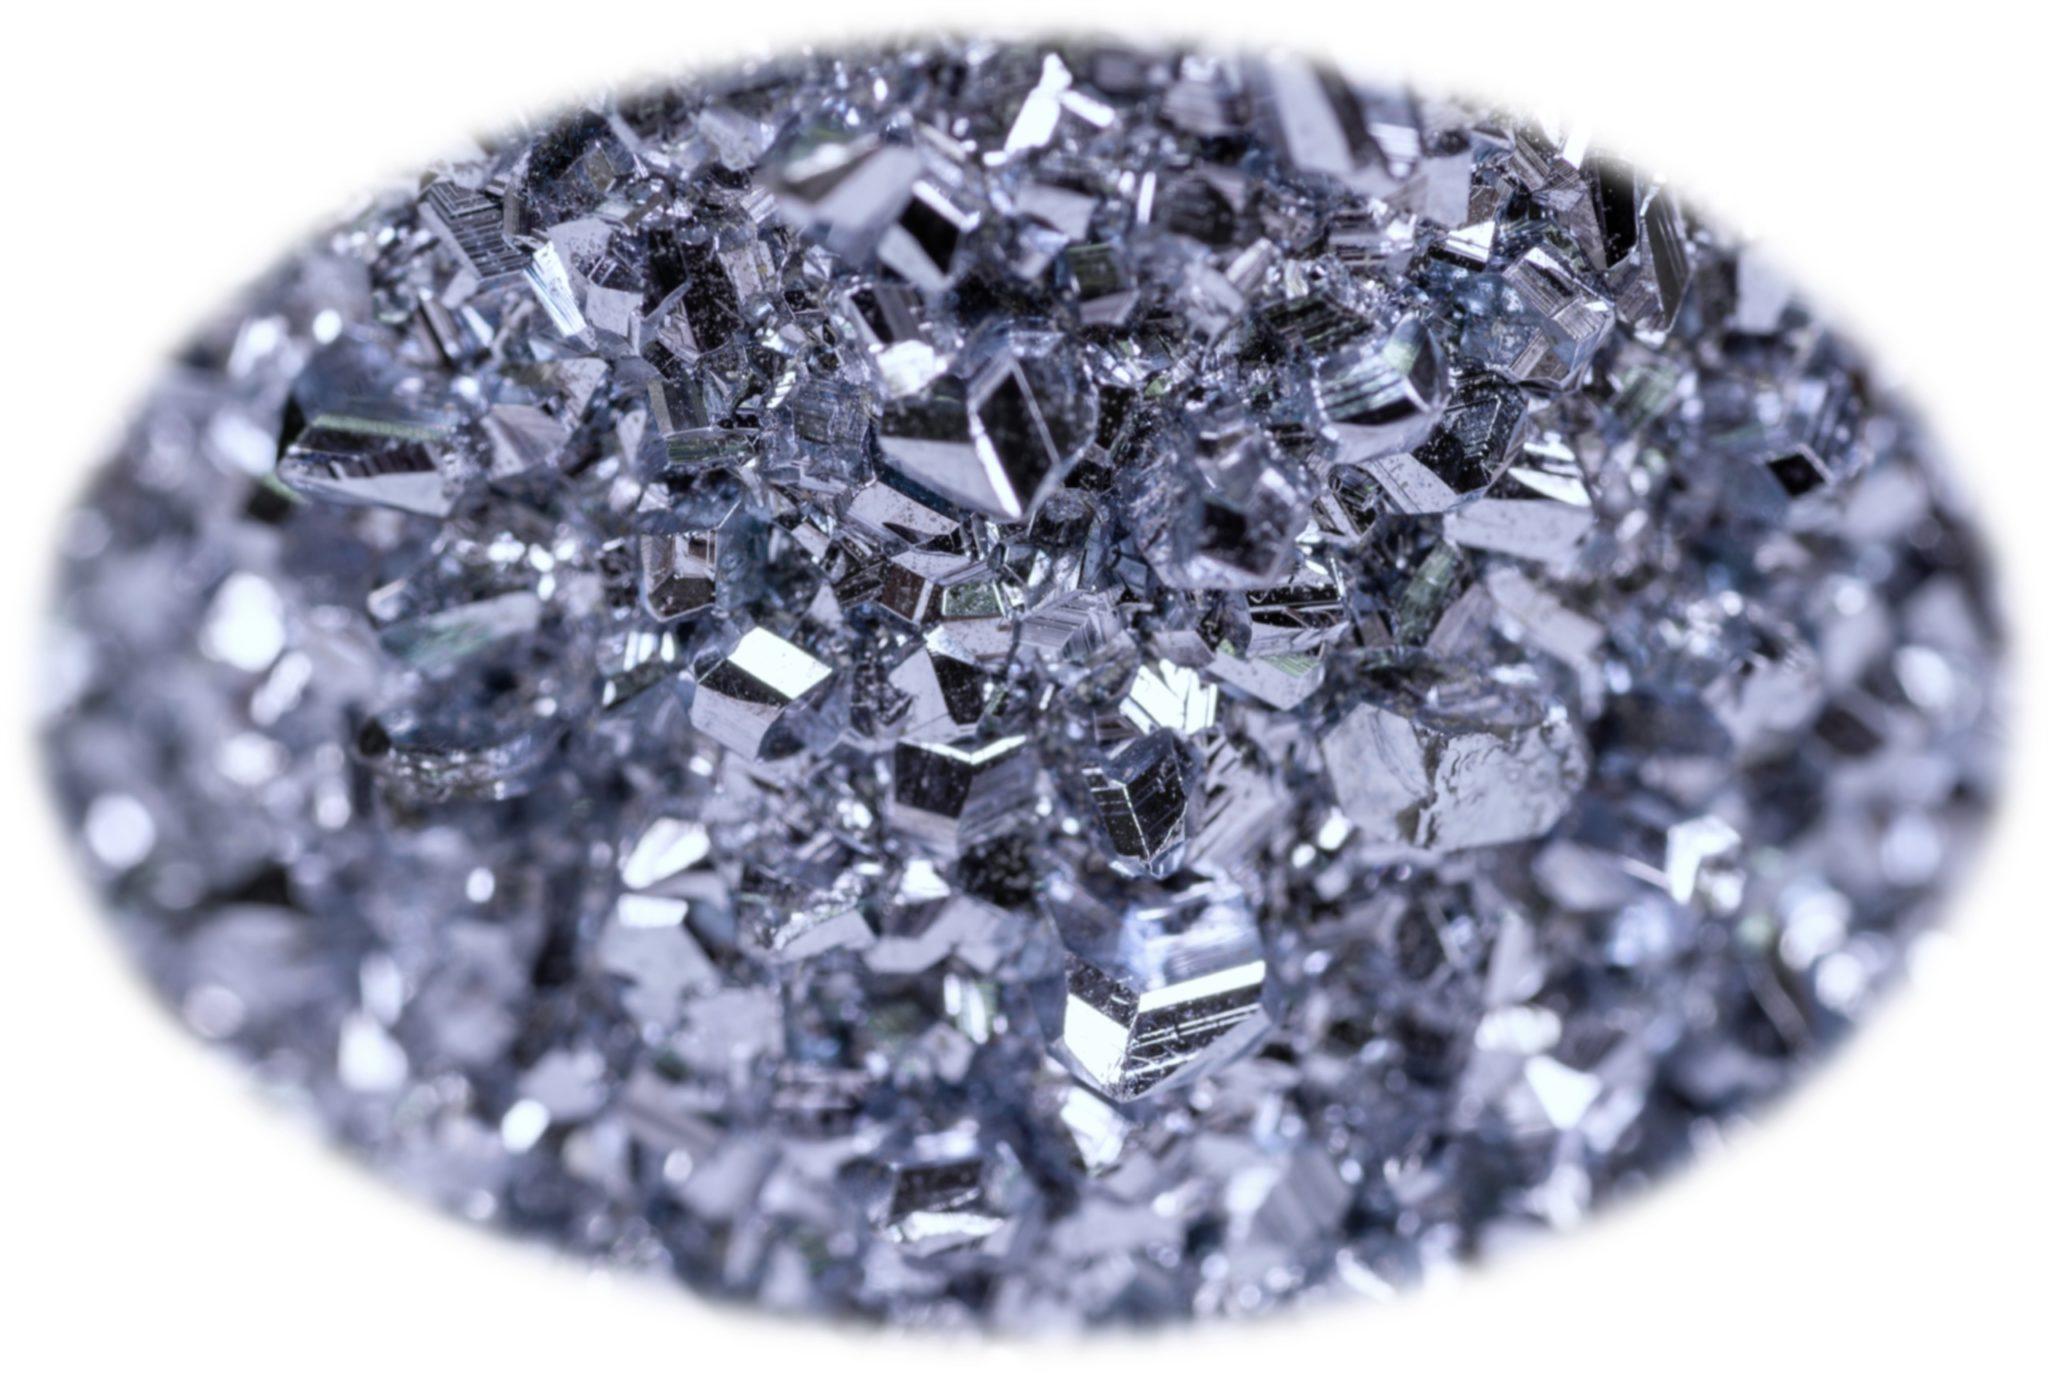 Kristalle vom Edelmetall Osmium unter dem Mikroskop